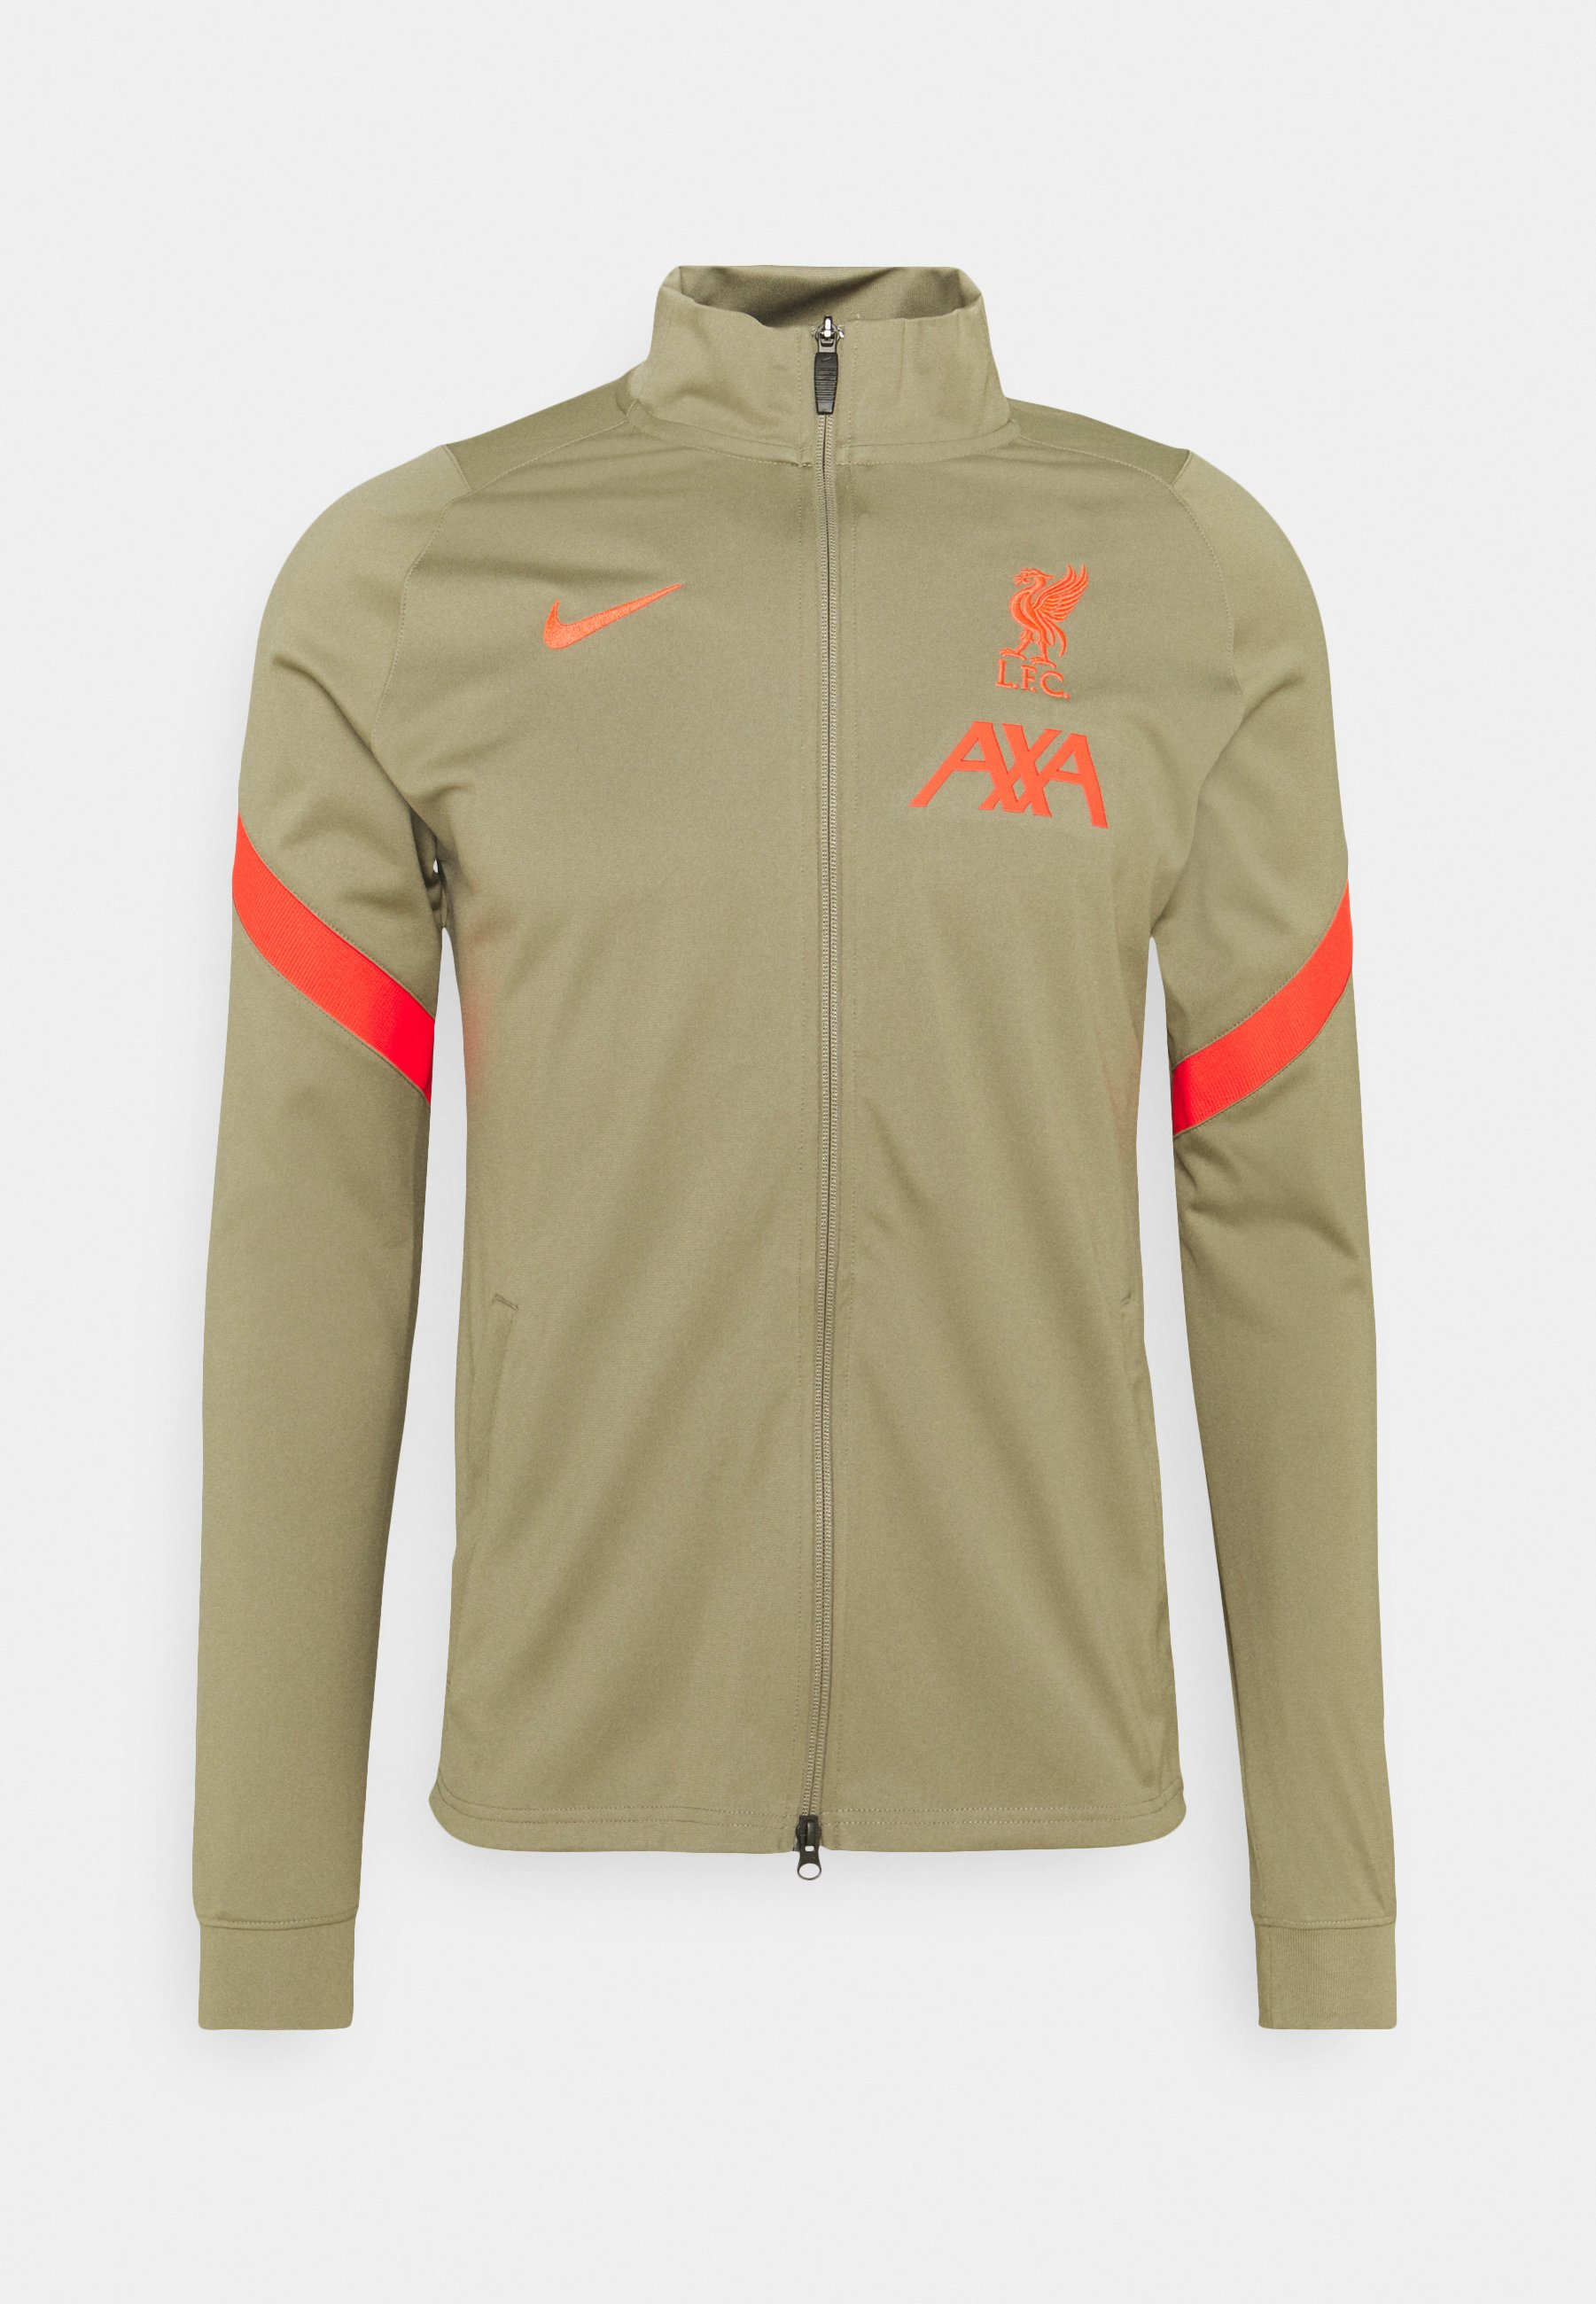 Men LIVERPOOL FC MNK DF STRK TRK JKT K - Club wear